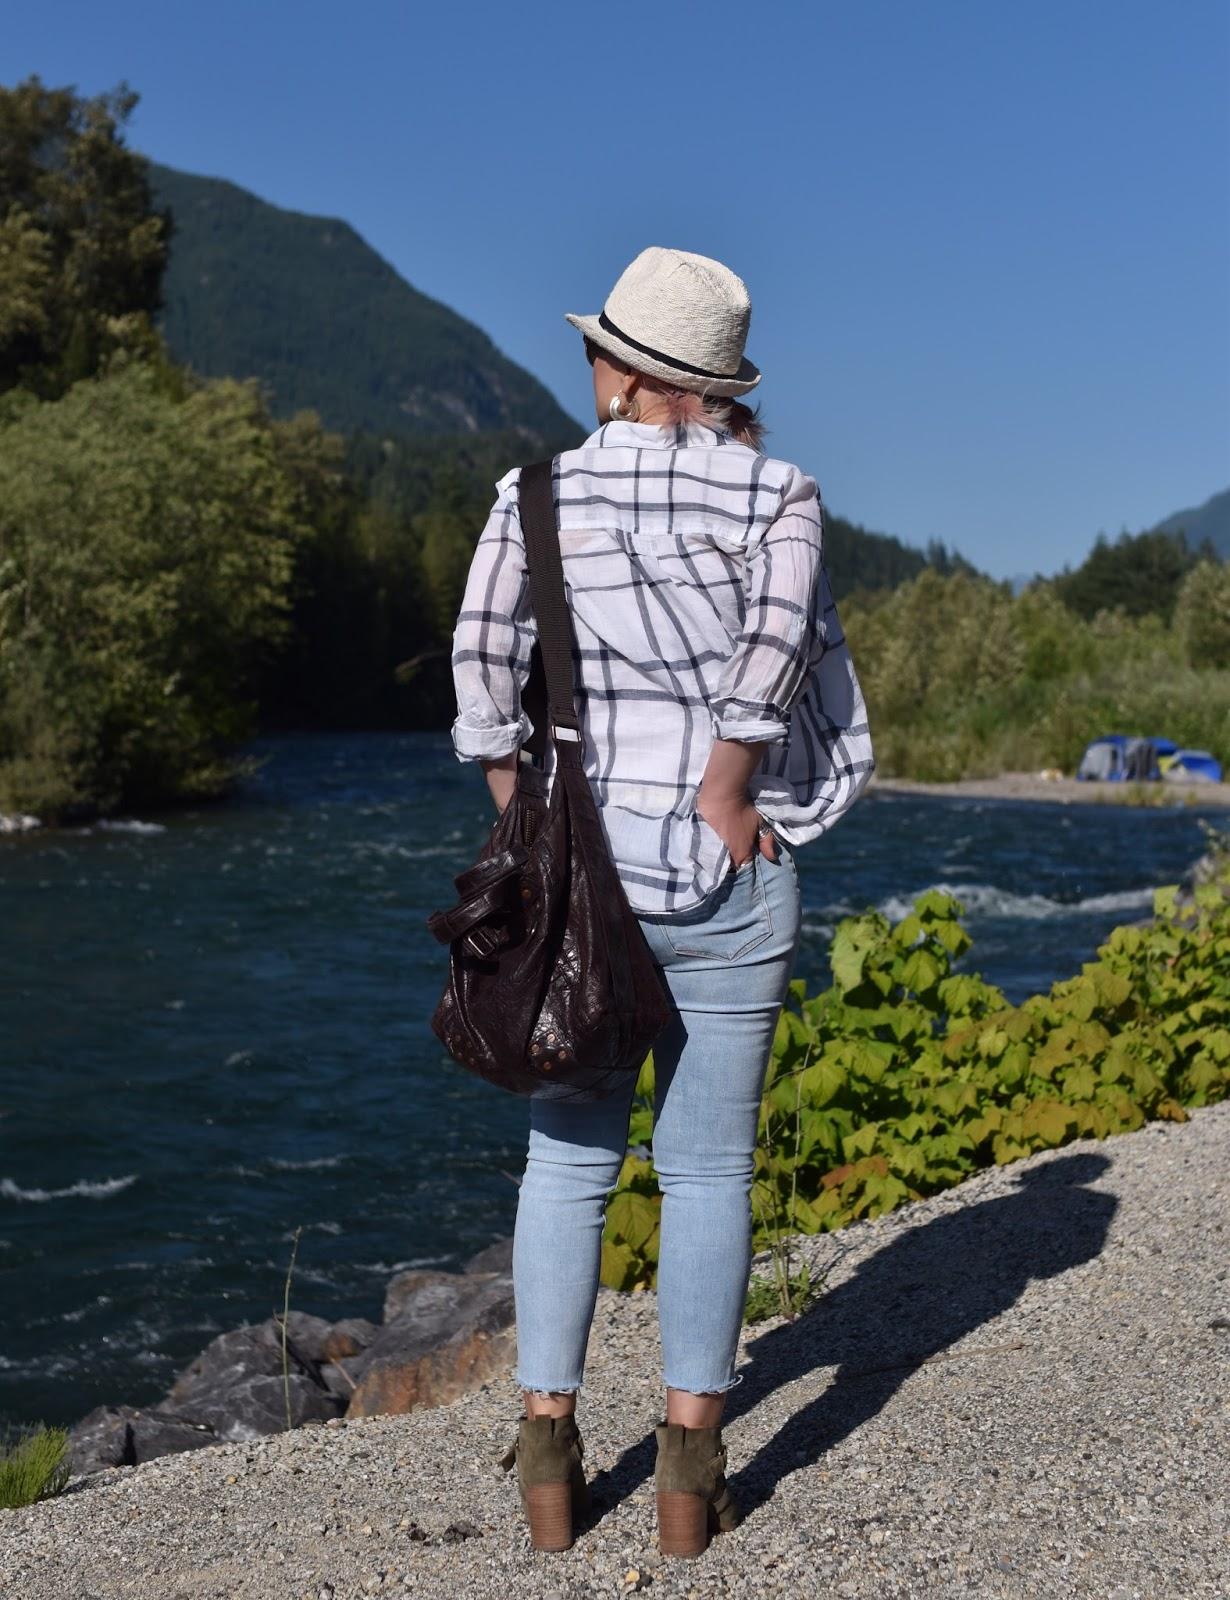 Monika Faulkner personal style inspiration - plaid shirt, skinny jeans, booties, straw fedora